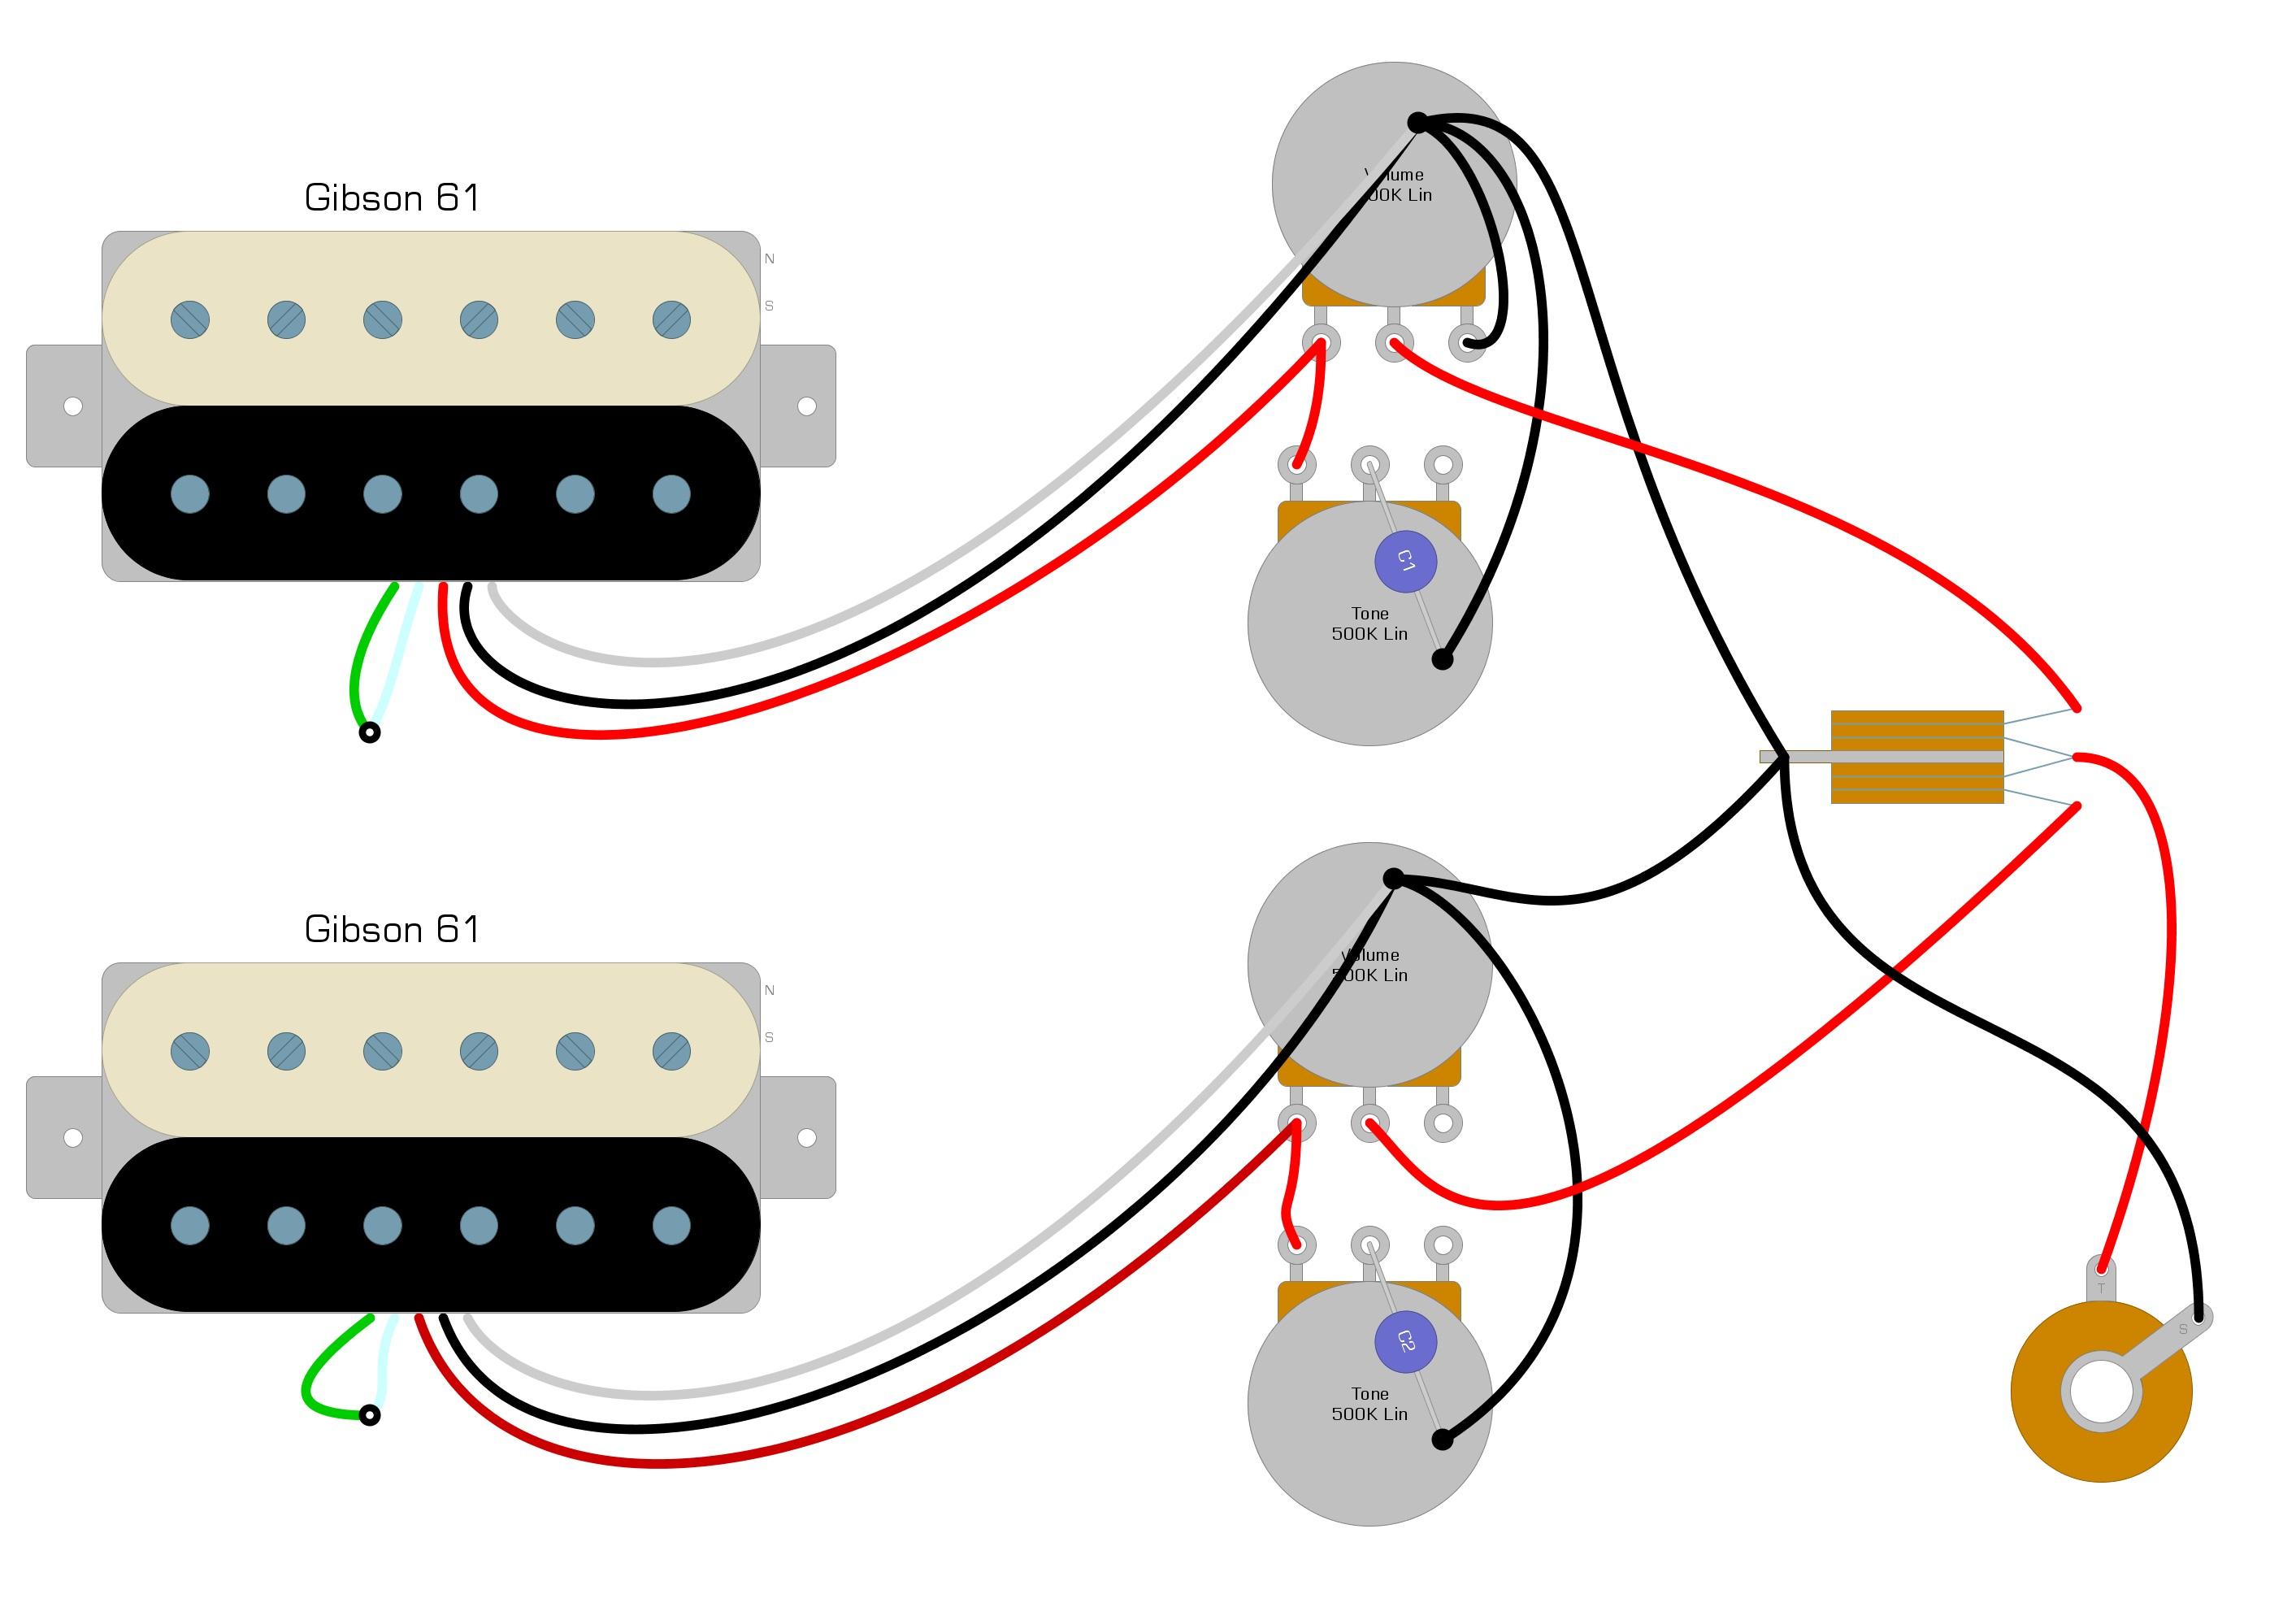 gibson 61 wiring diagram – humbucker soup  humbucker soup